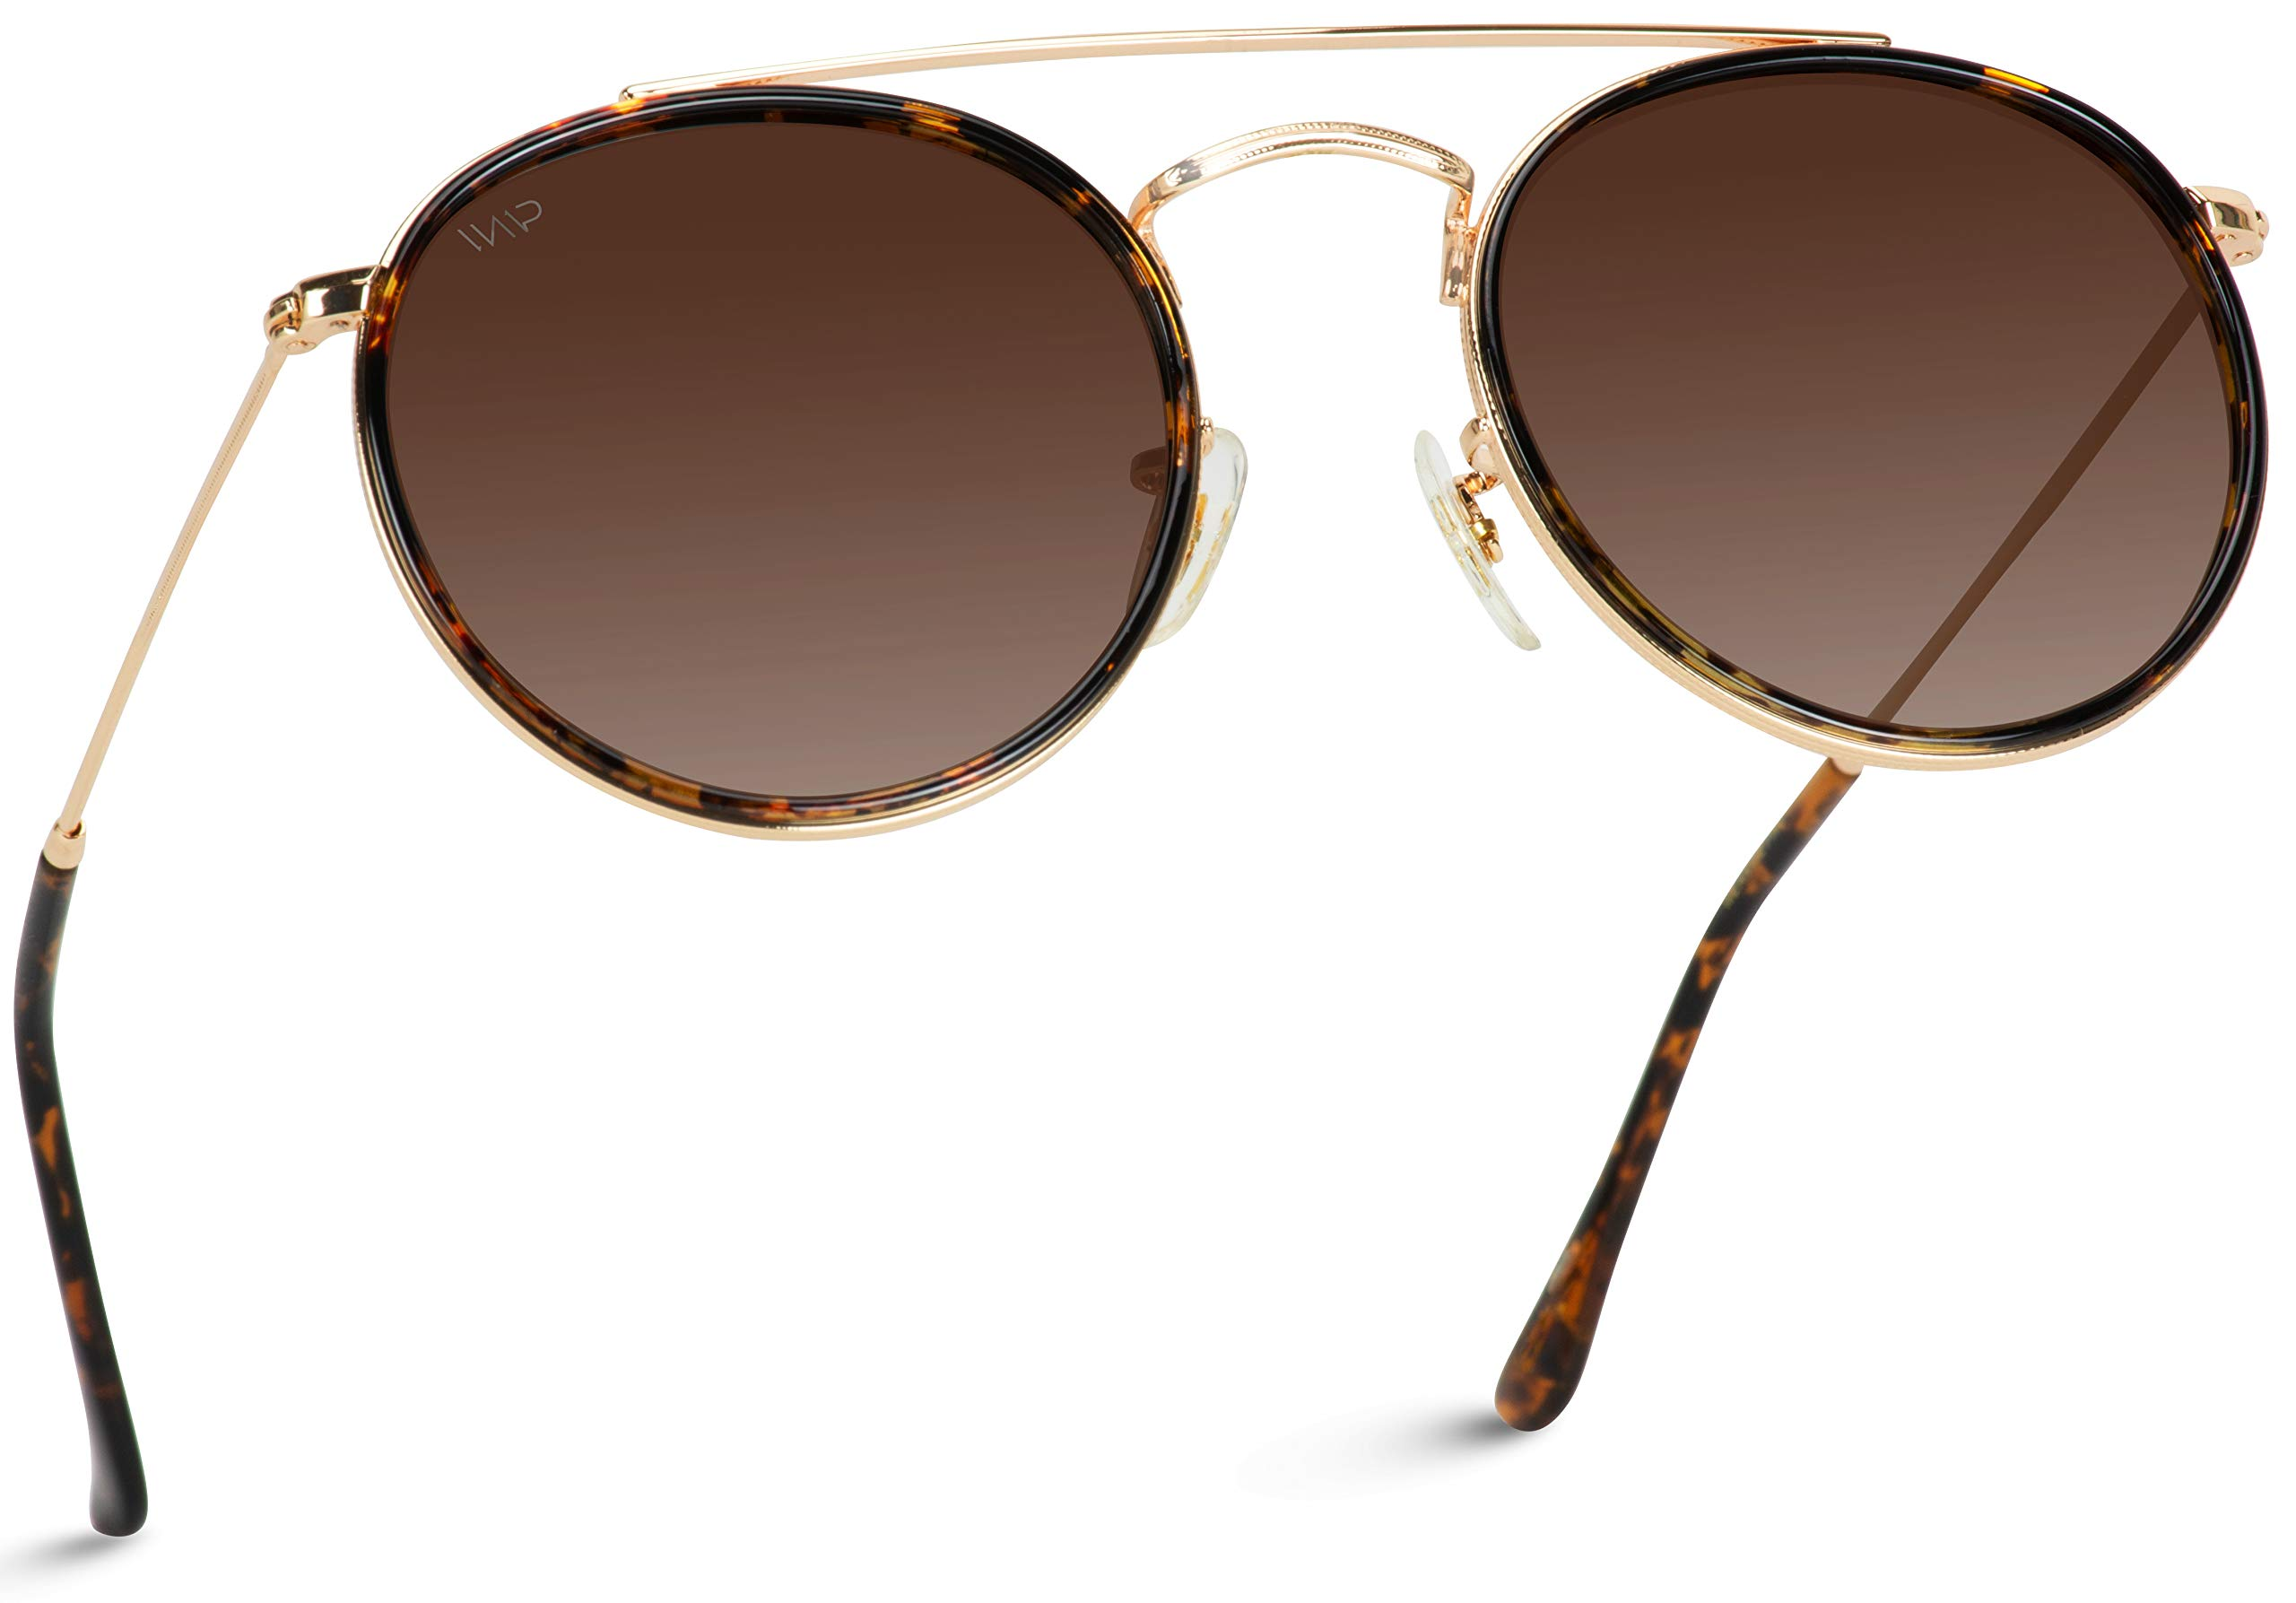 WearMe Pro - Round Double Bridge Polarized Modern Retro Sunglasses (Gold Frame/Brown Lens, 53) by WearMe Pro